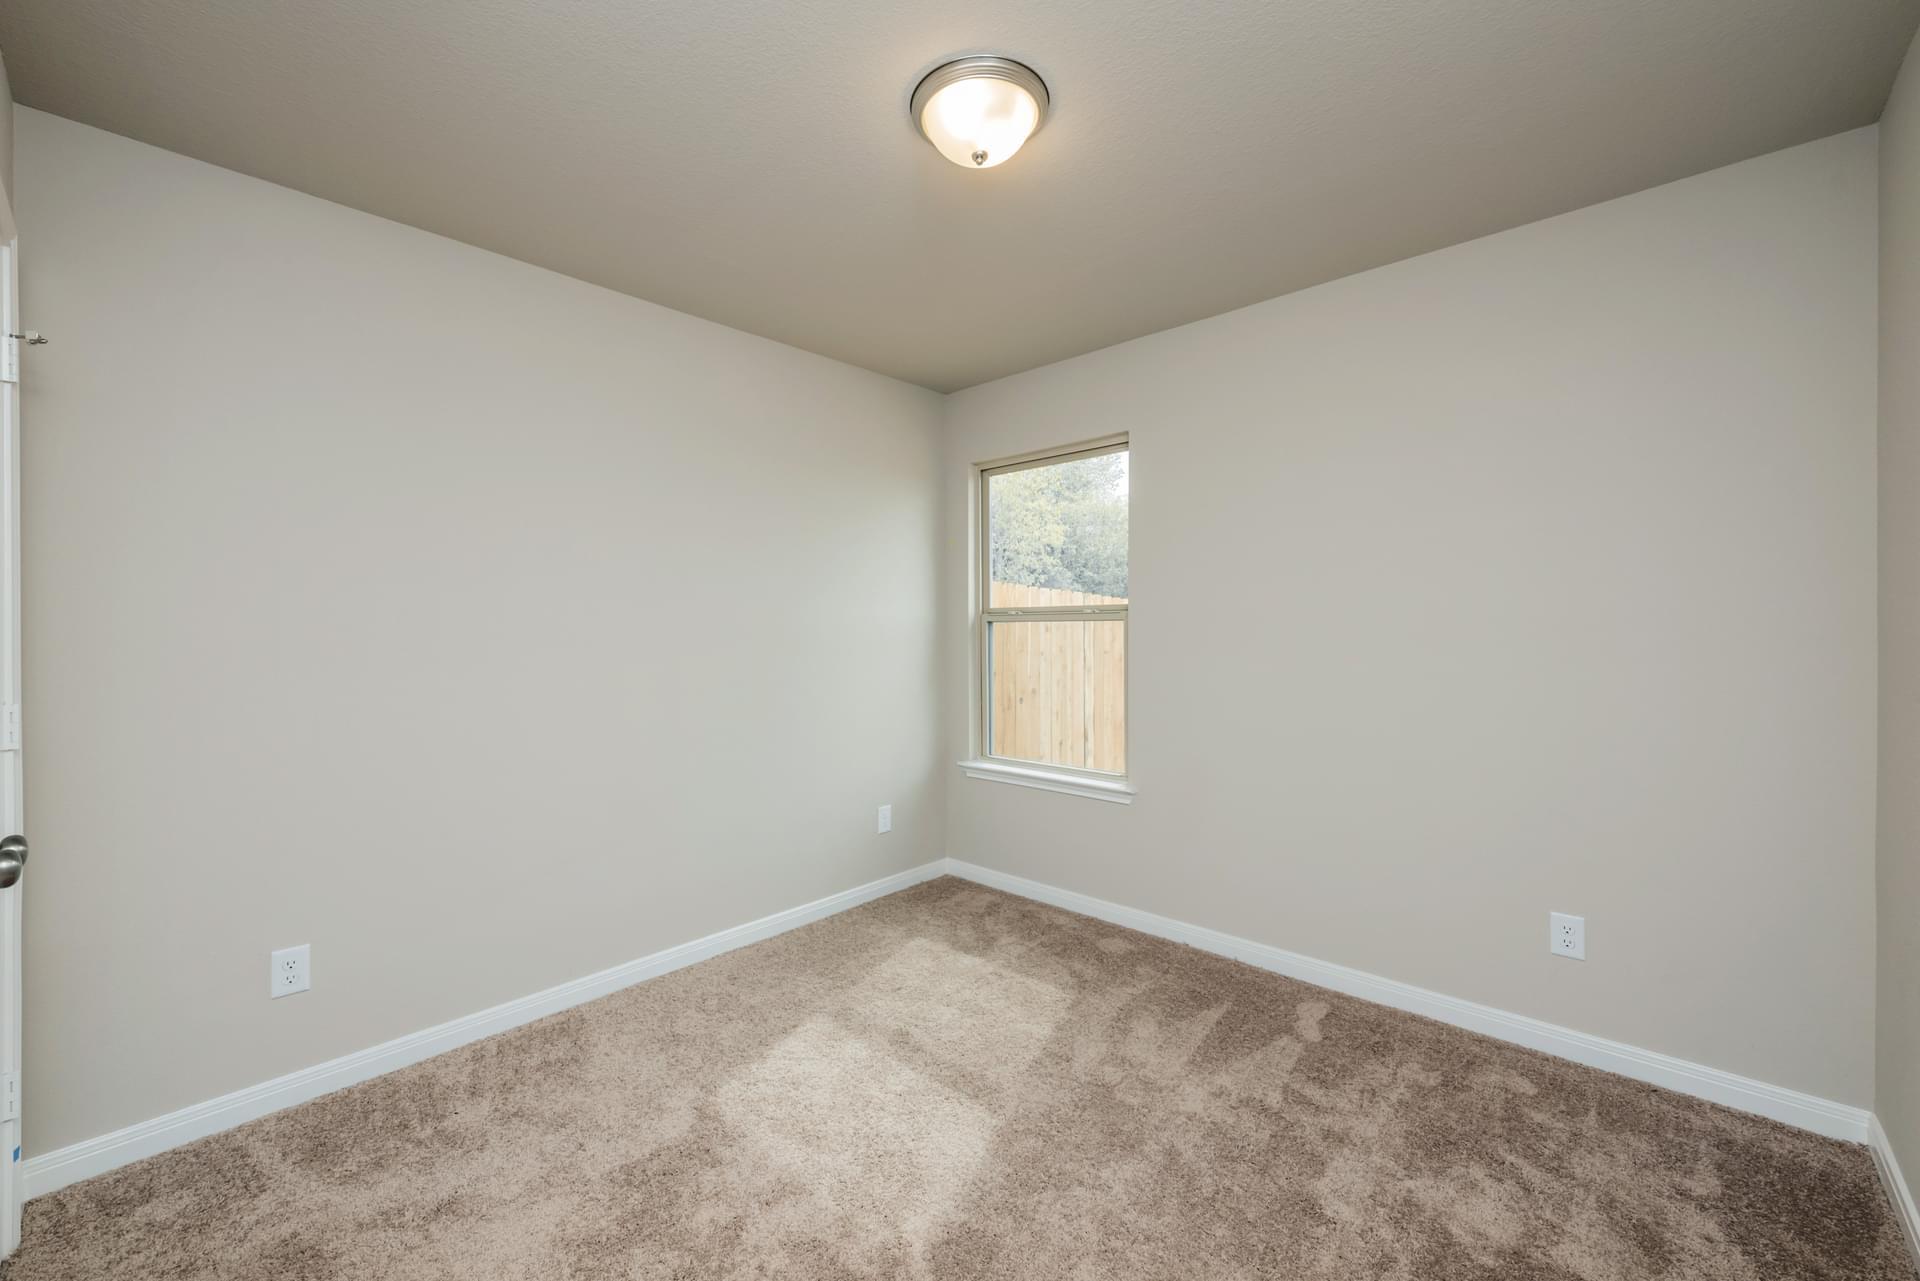 1,266sf New Home in Bryan, TX